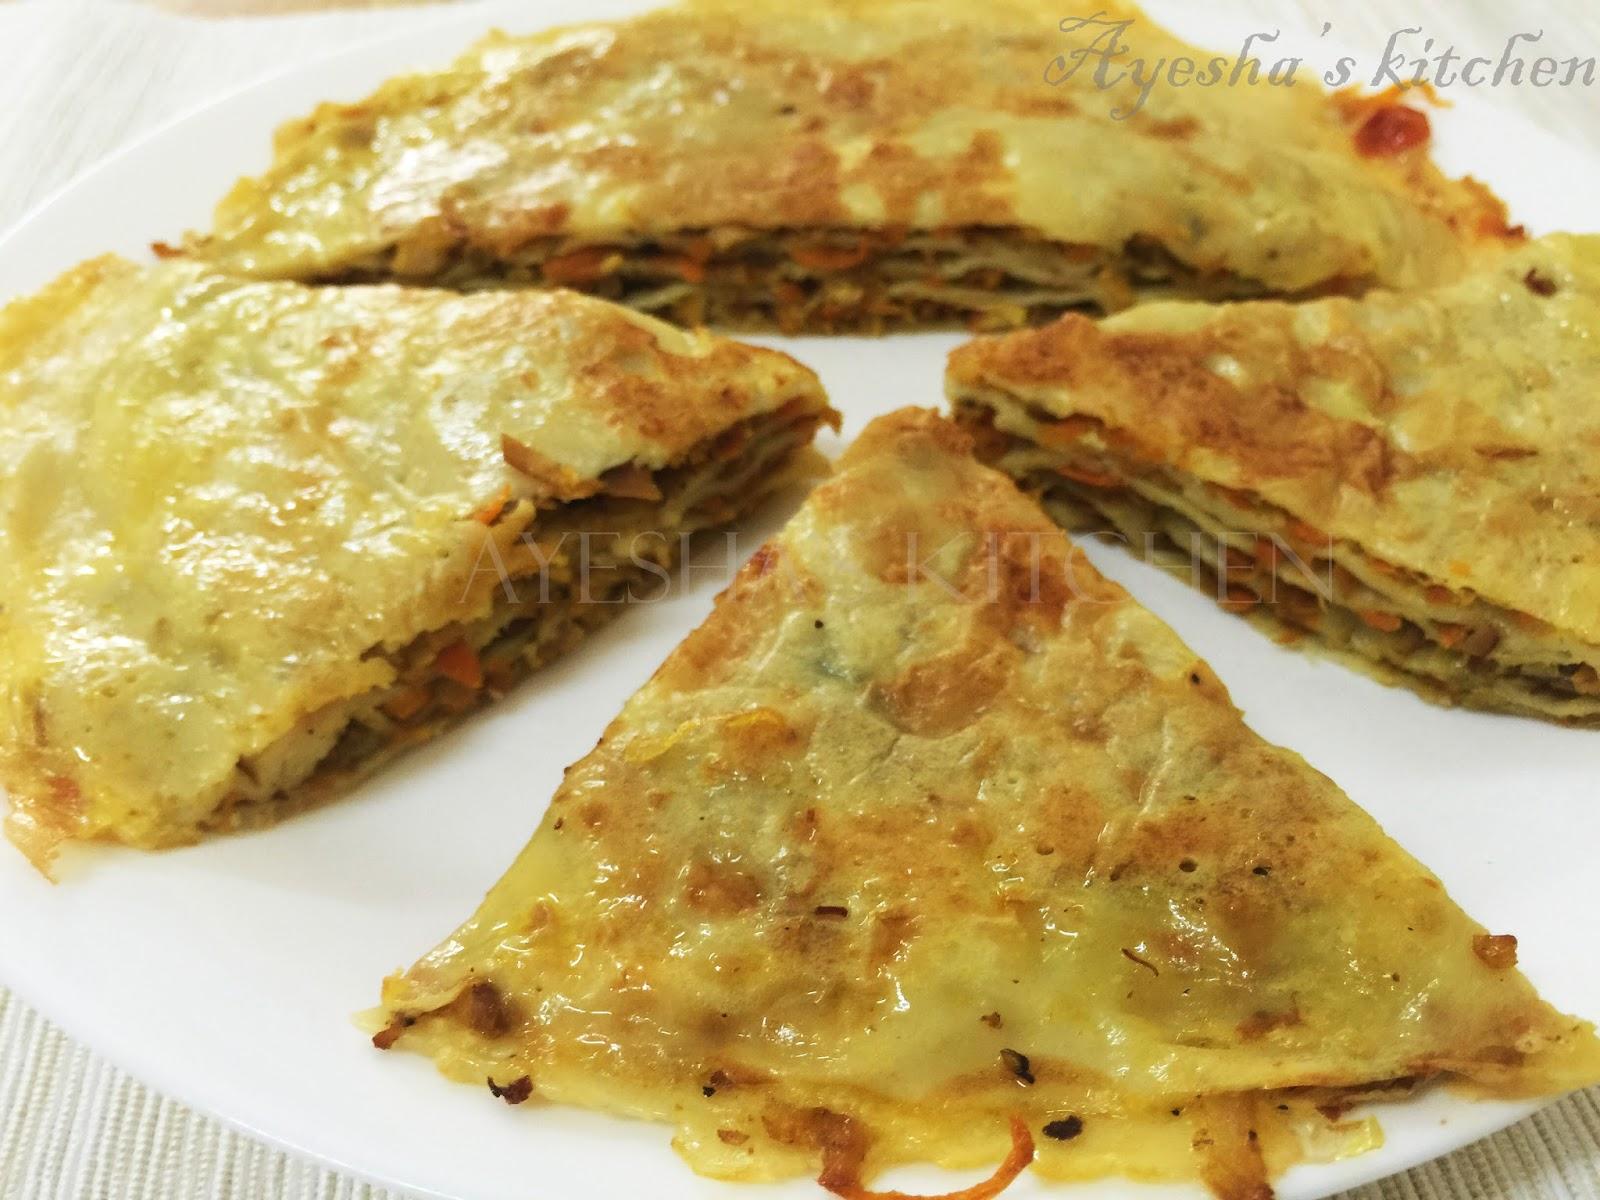 Kerala snacks malabar chattippathiri athishayapathiri layered i am here sharing for you the recipe of a savory chatti pathiri so lets see how to make meat lasagna recipe in kerala style kerala chattipathiri forumfinder Images